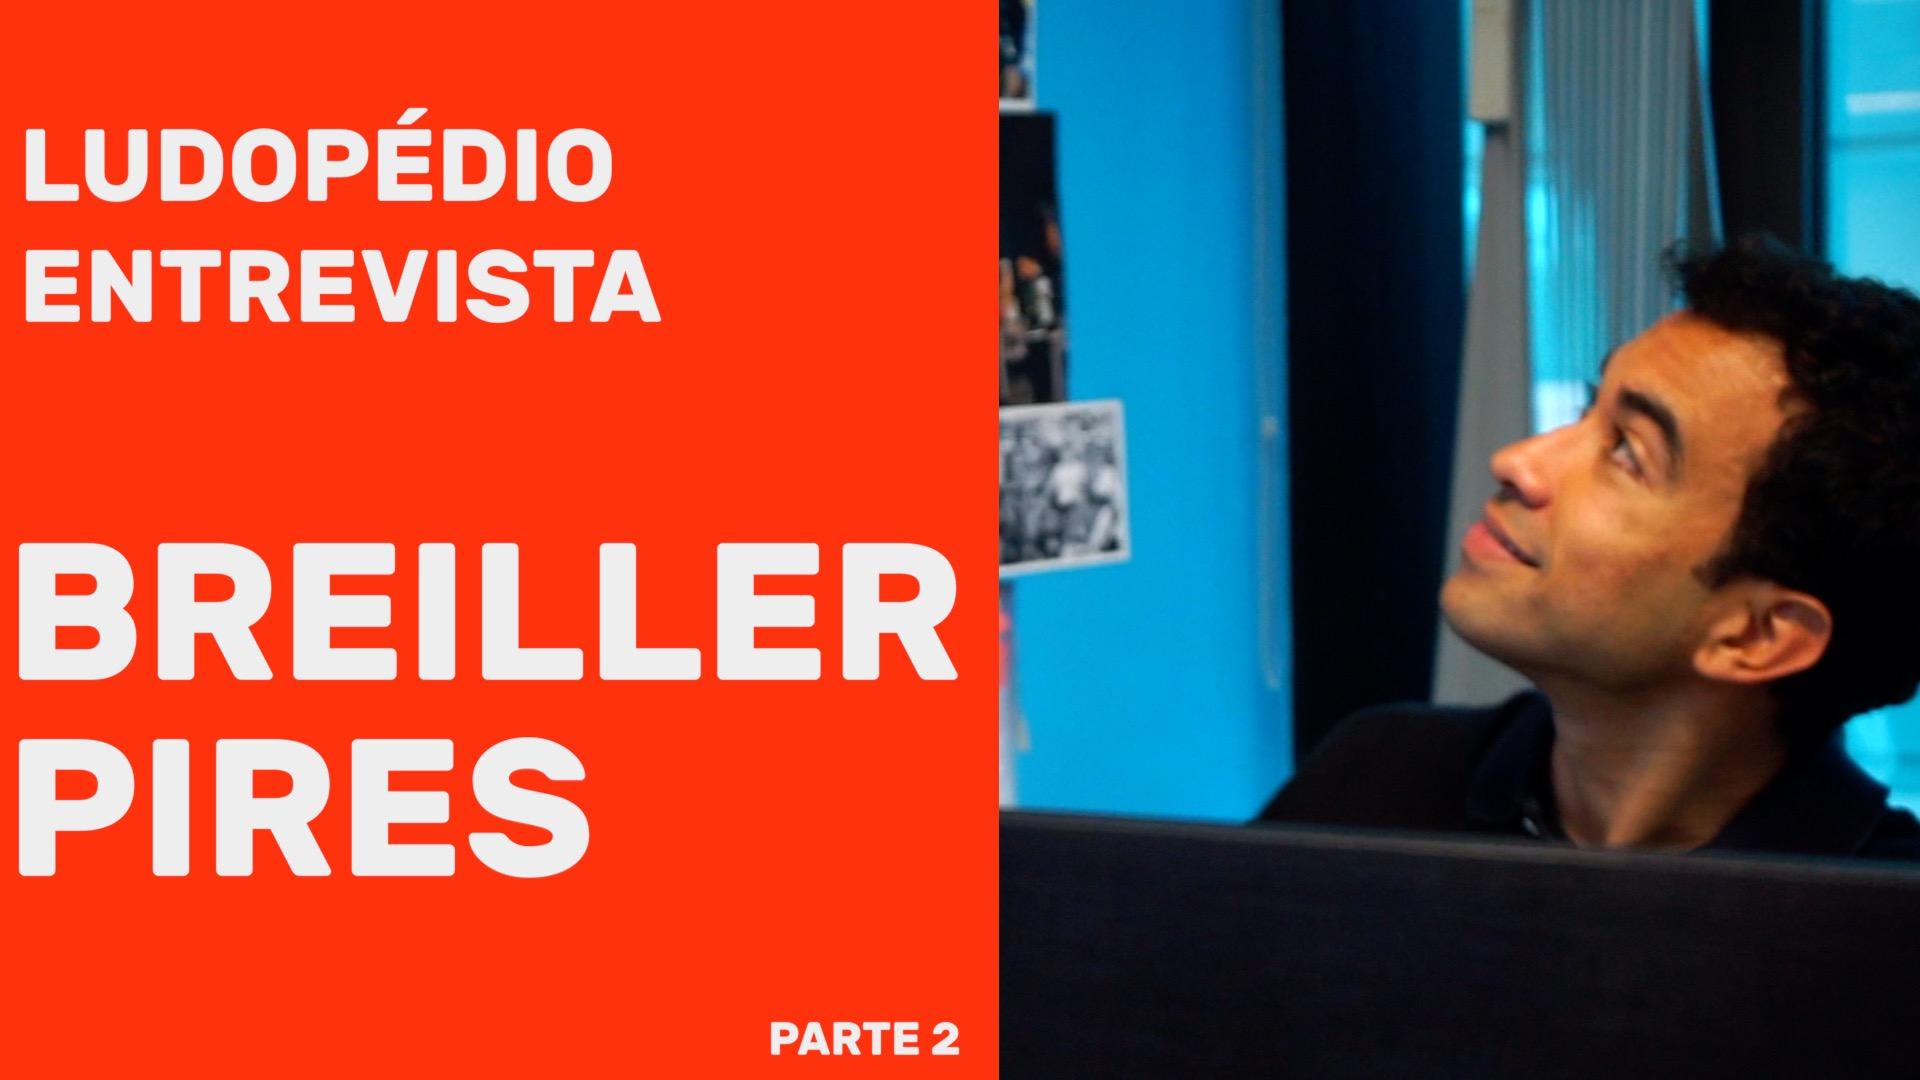 Ludopédio entrevista Breiller Pires – Parte 2